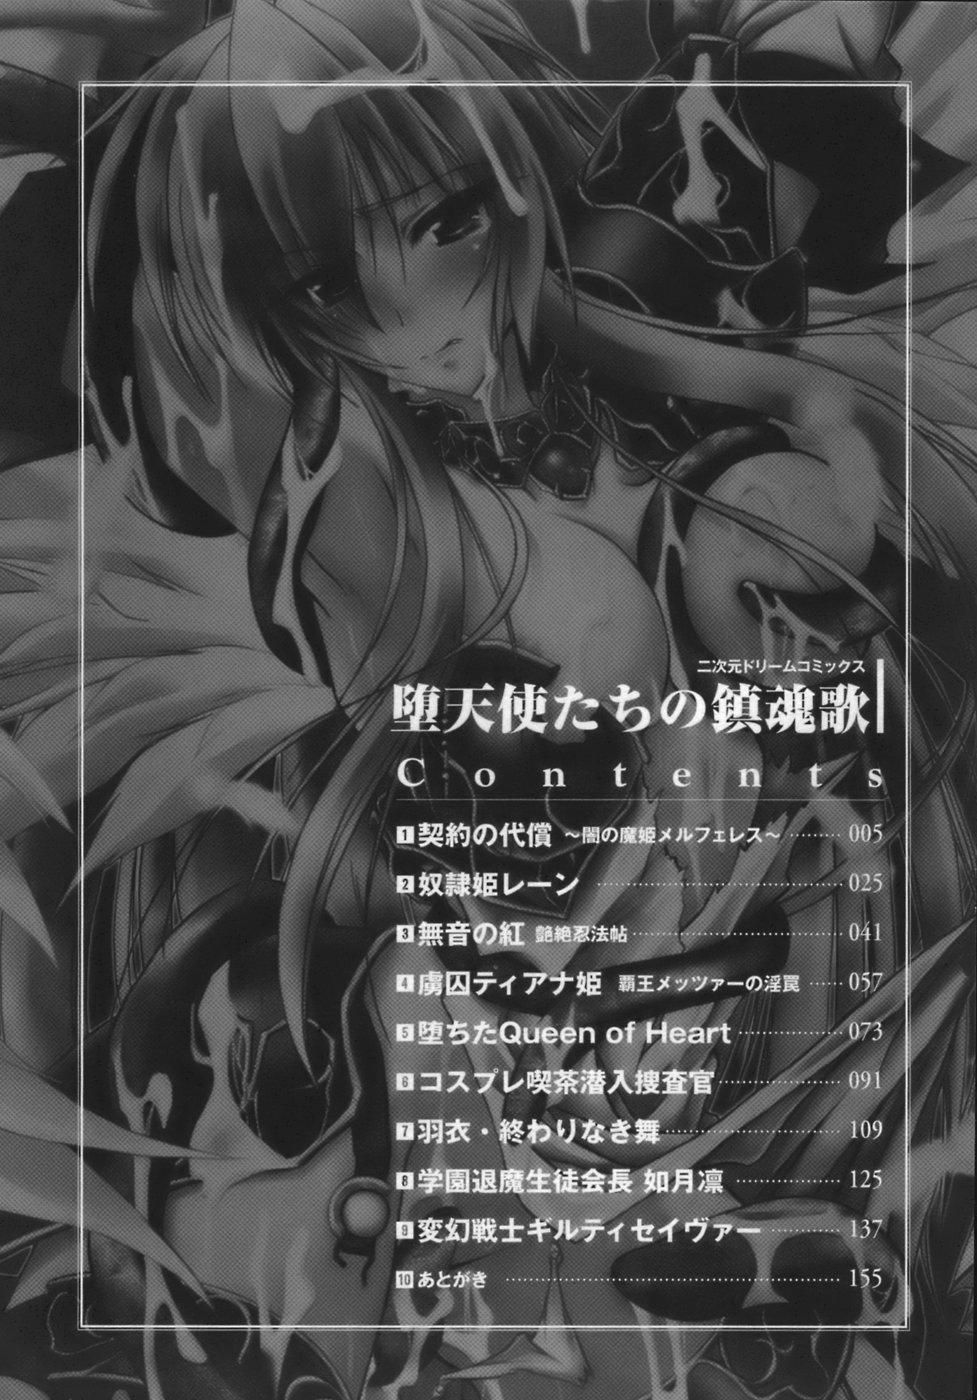 [Parfait] Datenshi-tachi no Chinkonka - Fallen Angels Requiem 4